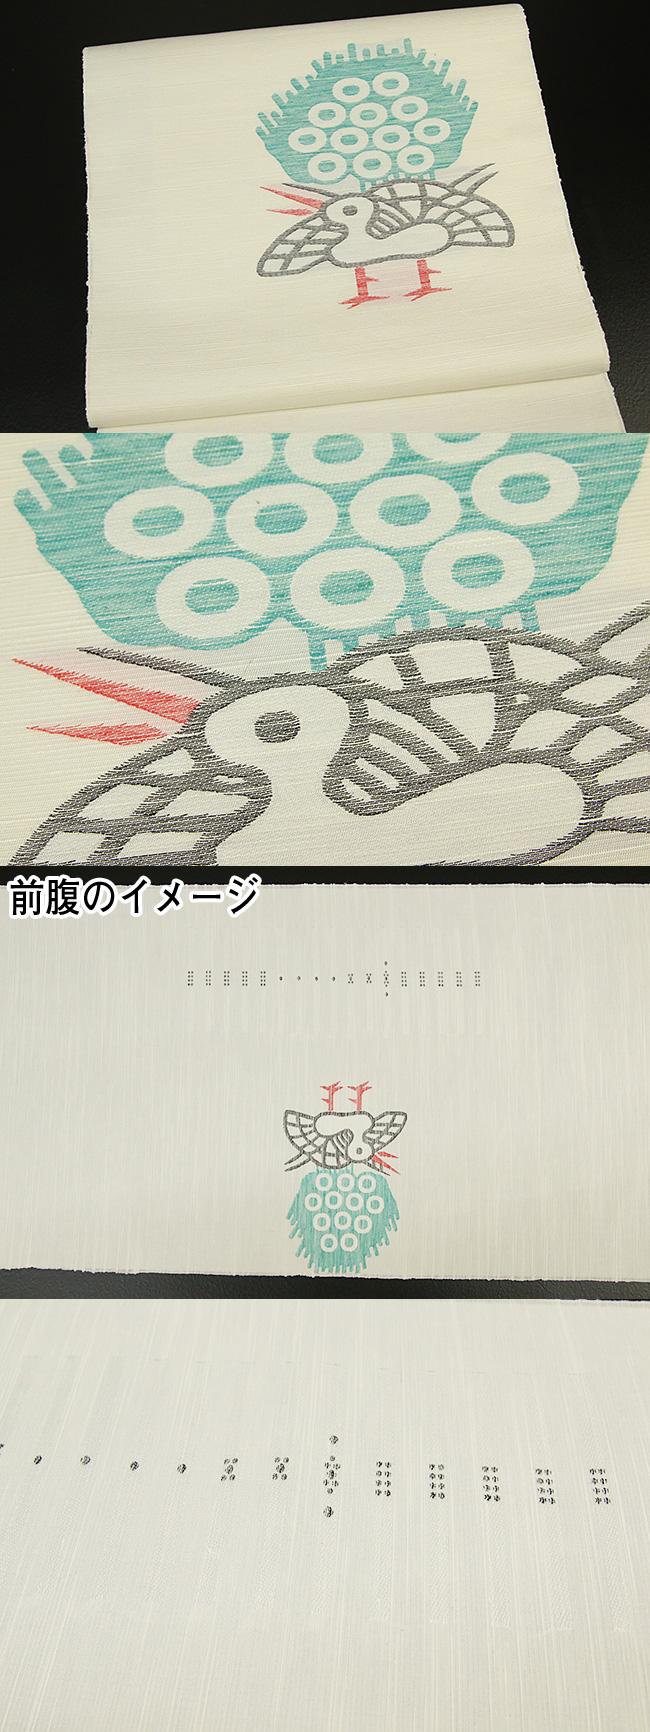 96_tsutaya_obi0202